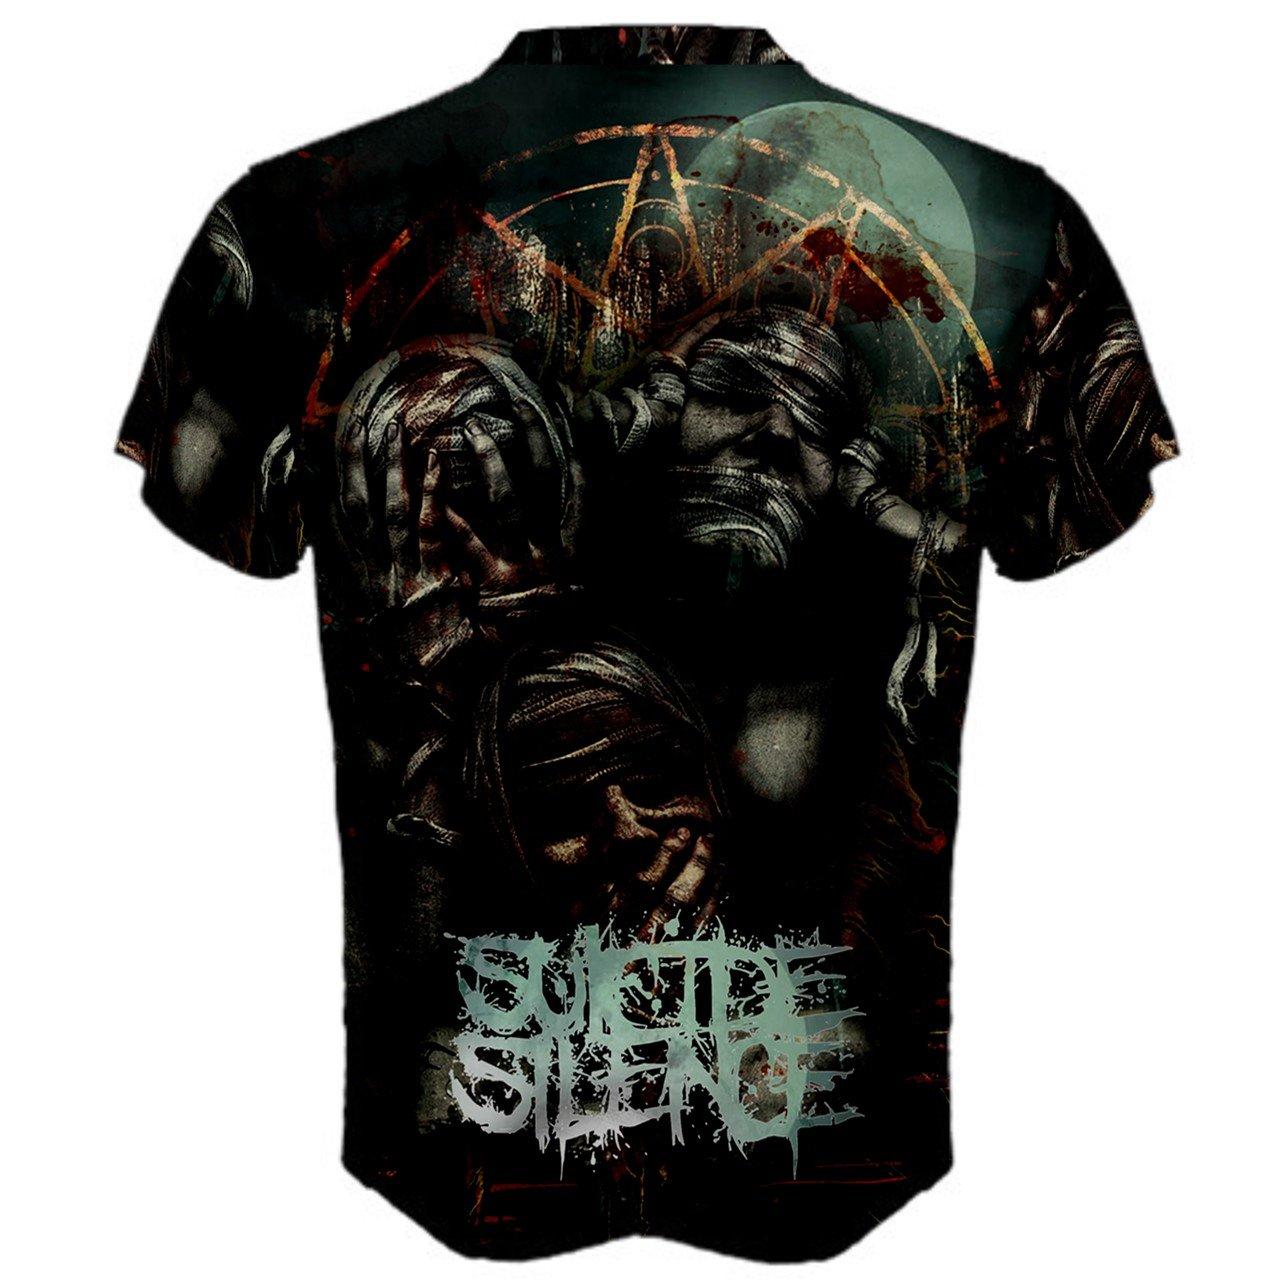 7bec5cbcb Amazon.com : Suicide Silence Rock Metal Fans Psychedelic Hallucinogen  Trippy hipie Full 3D Sublimation Men T-Shirt Full 3D Custom Print T shirt  Tees ...